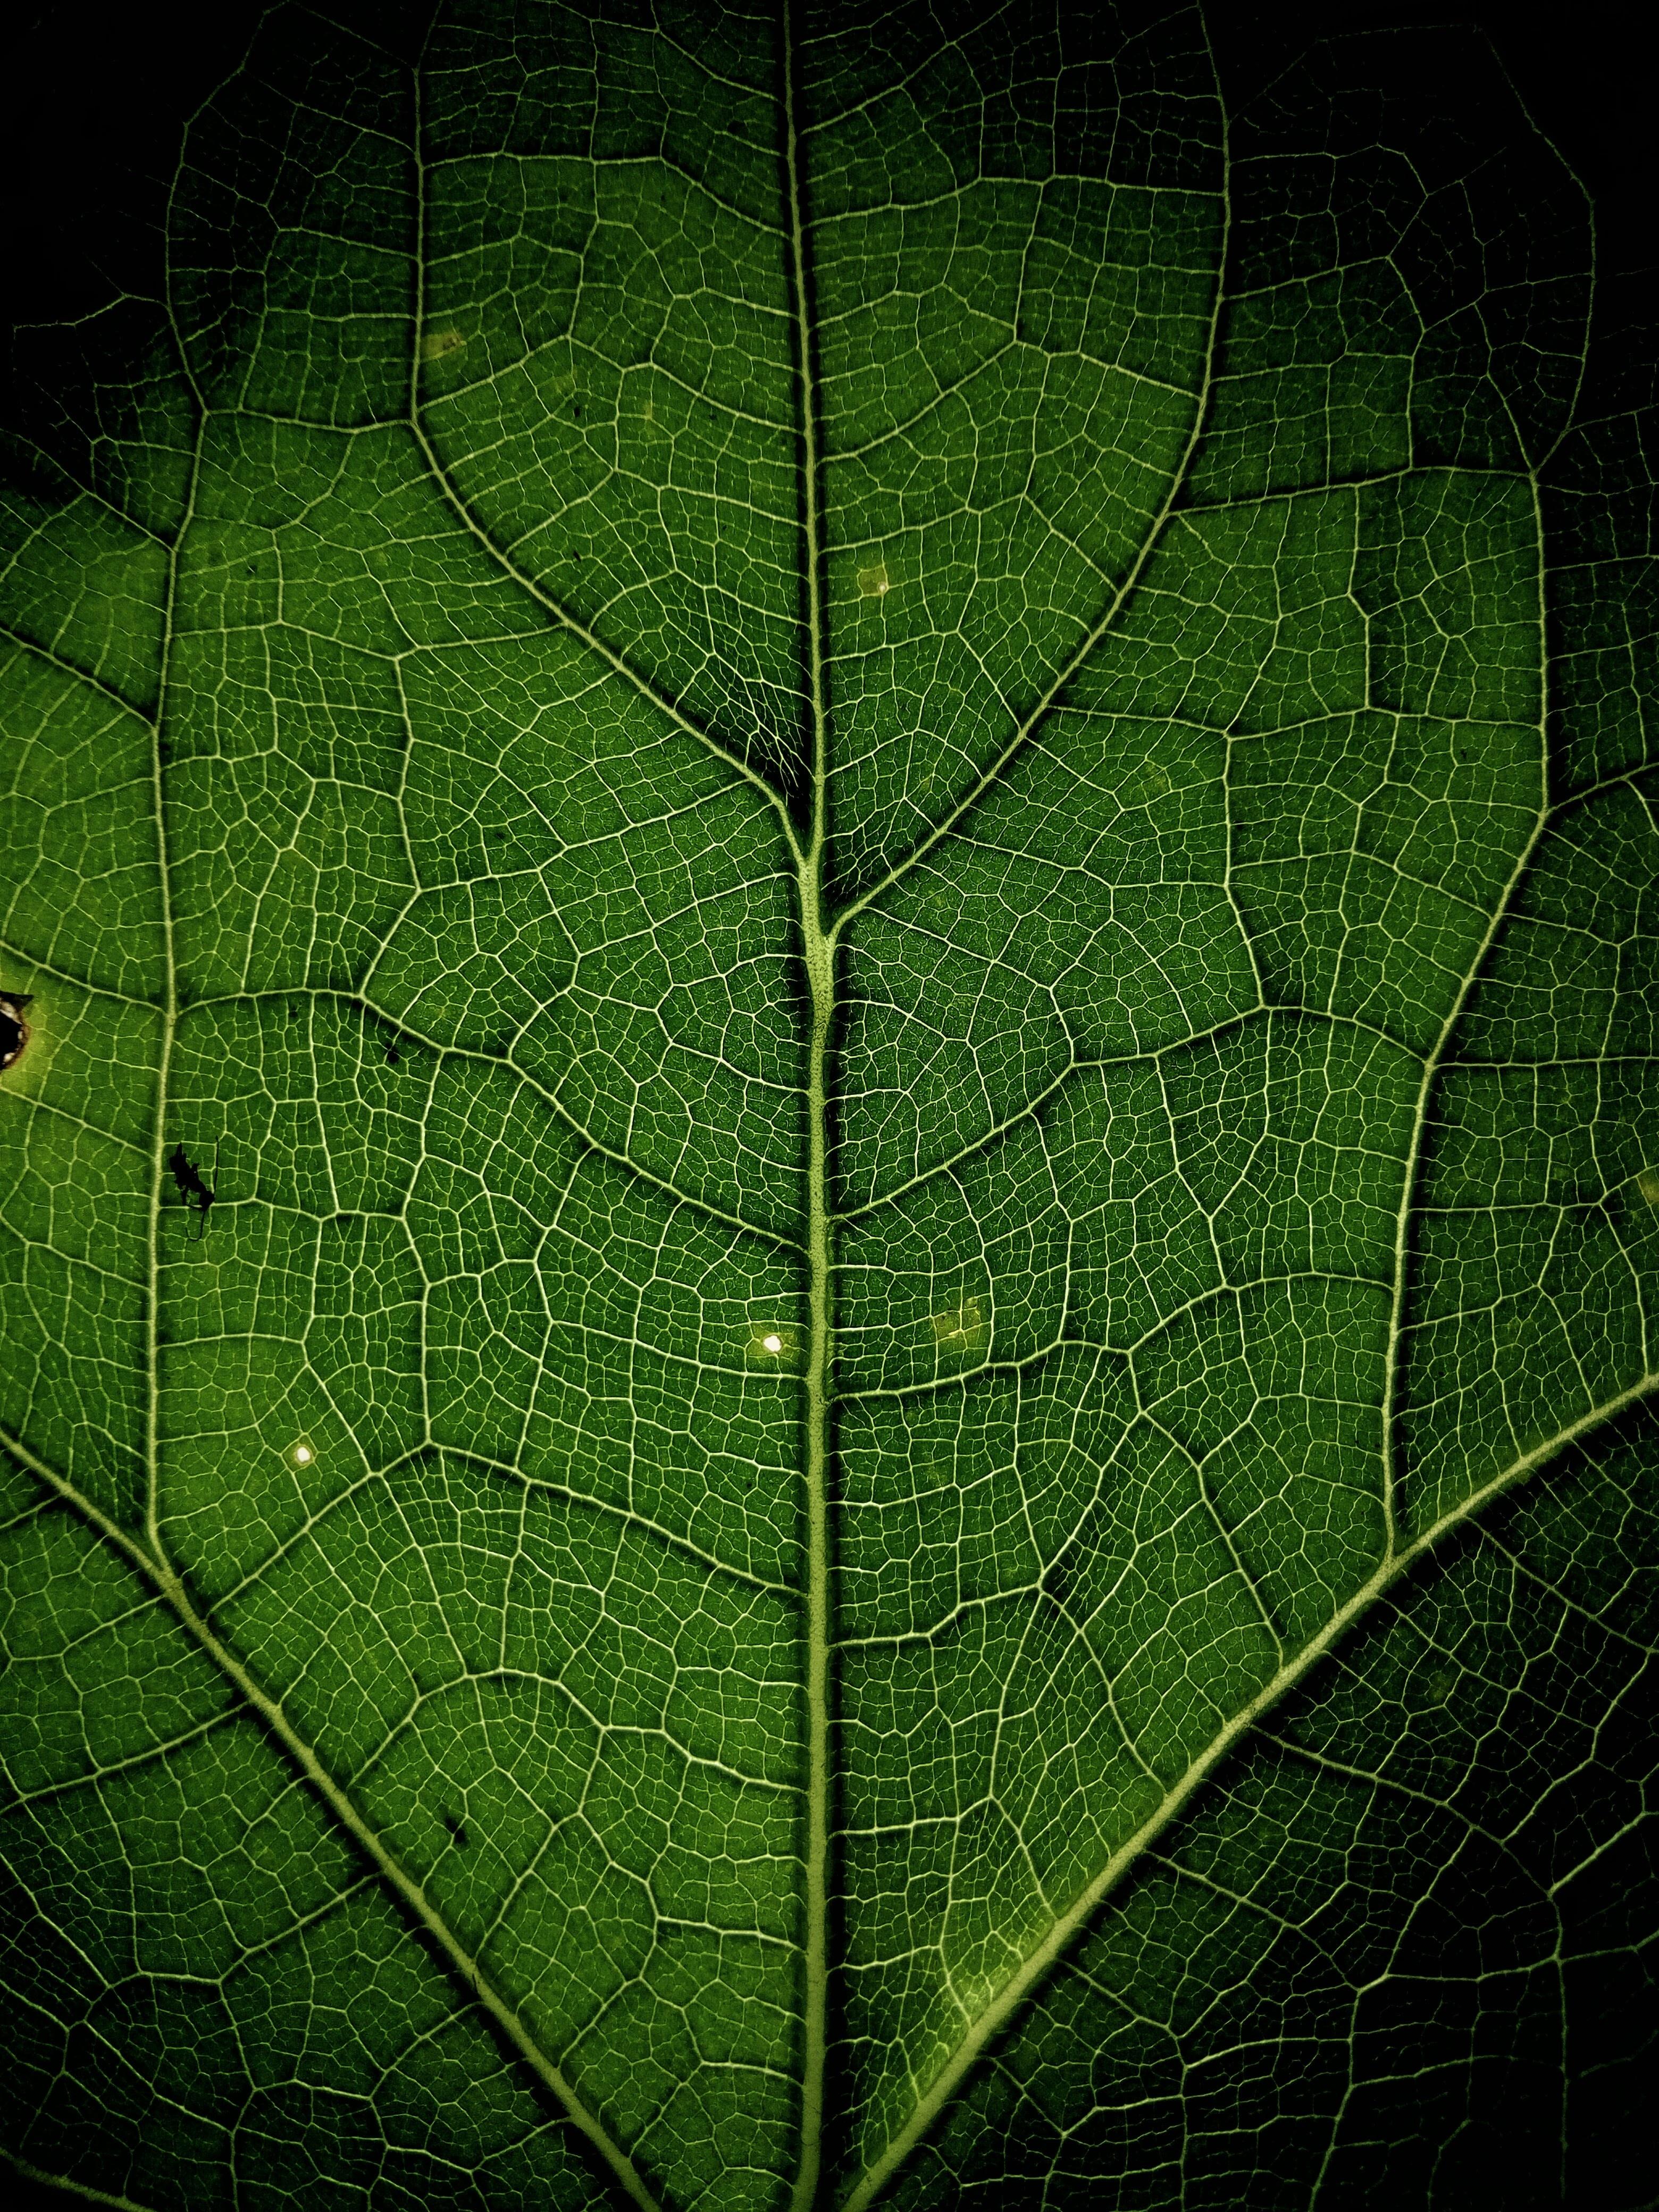 close up photo of leaf